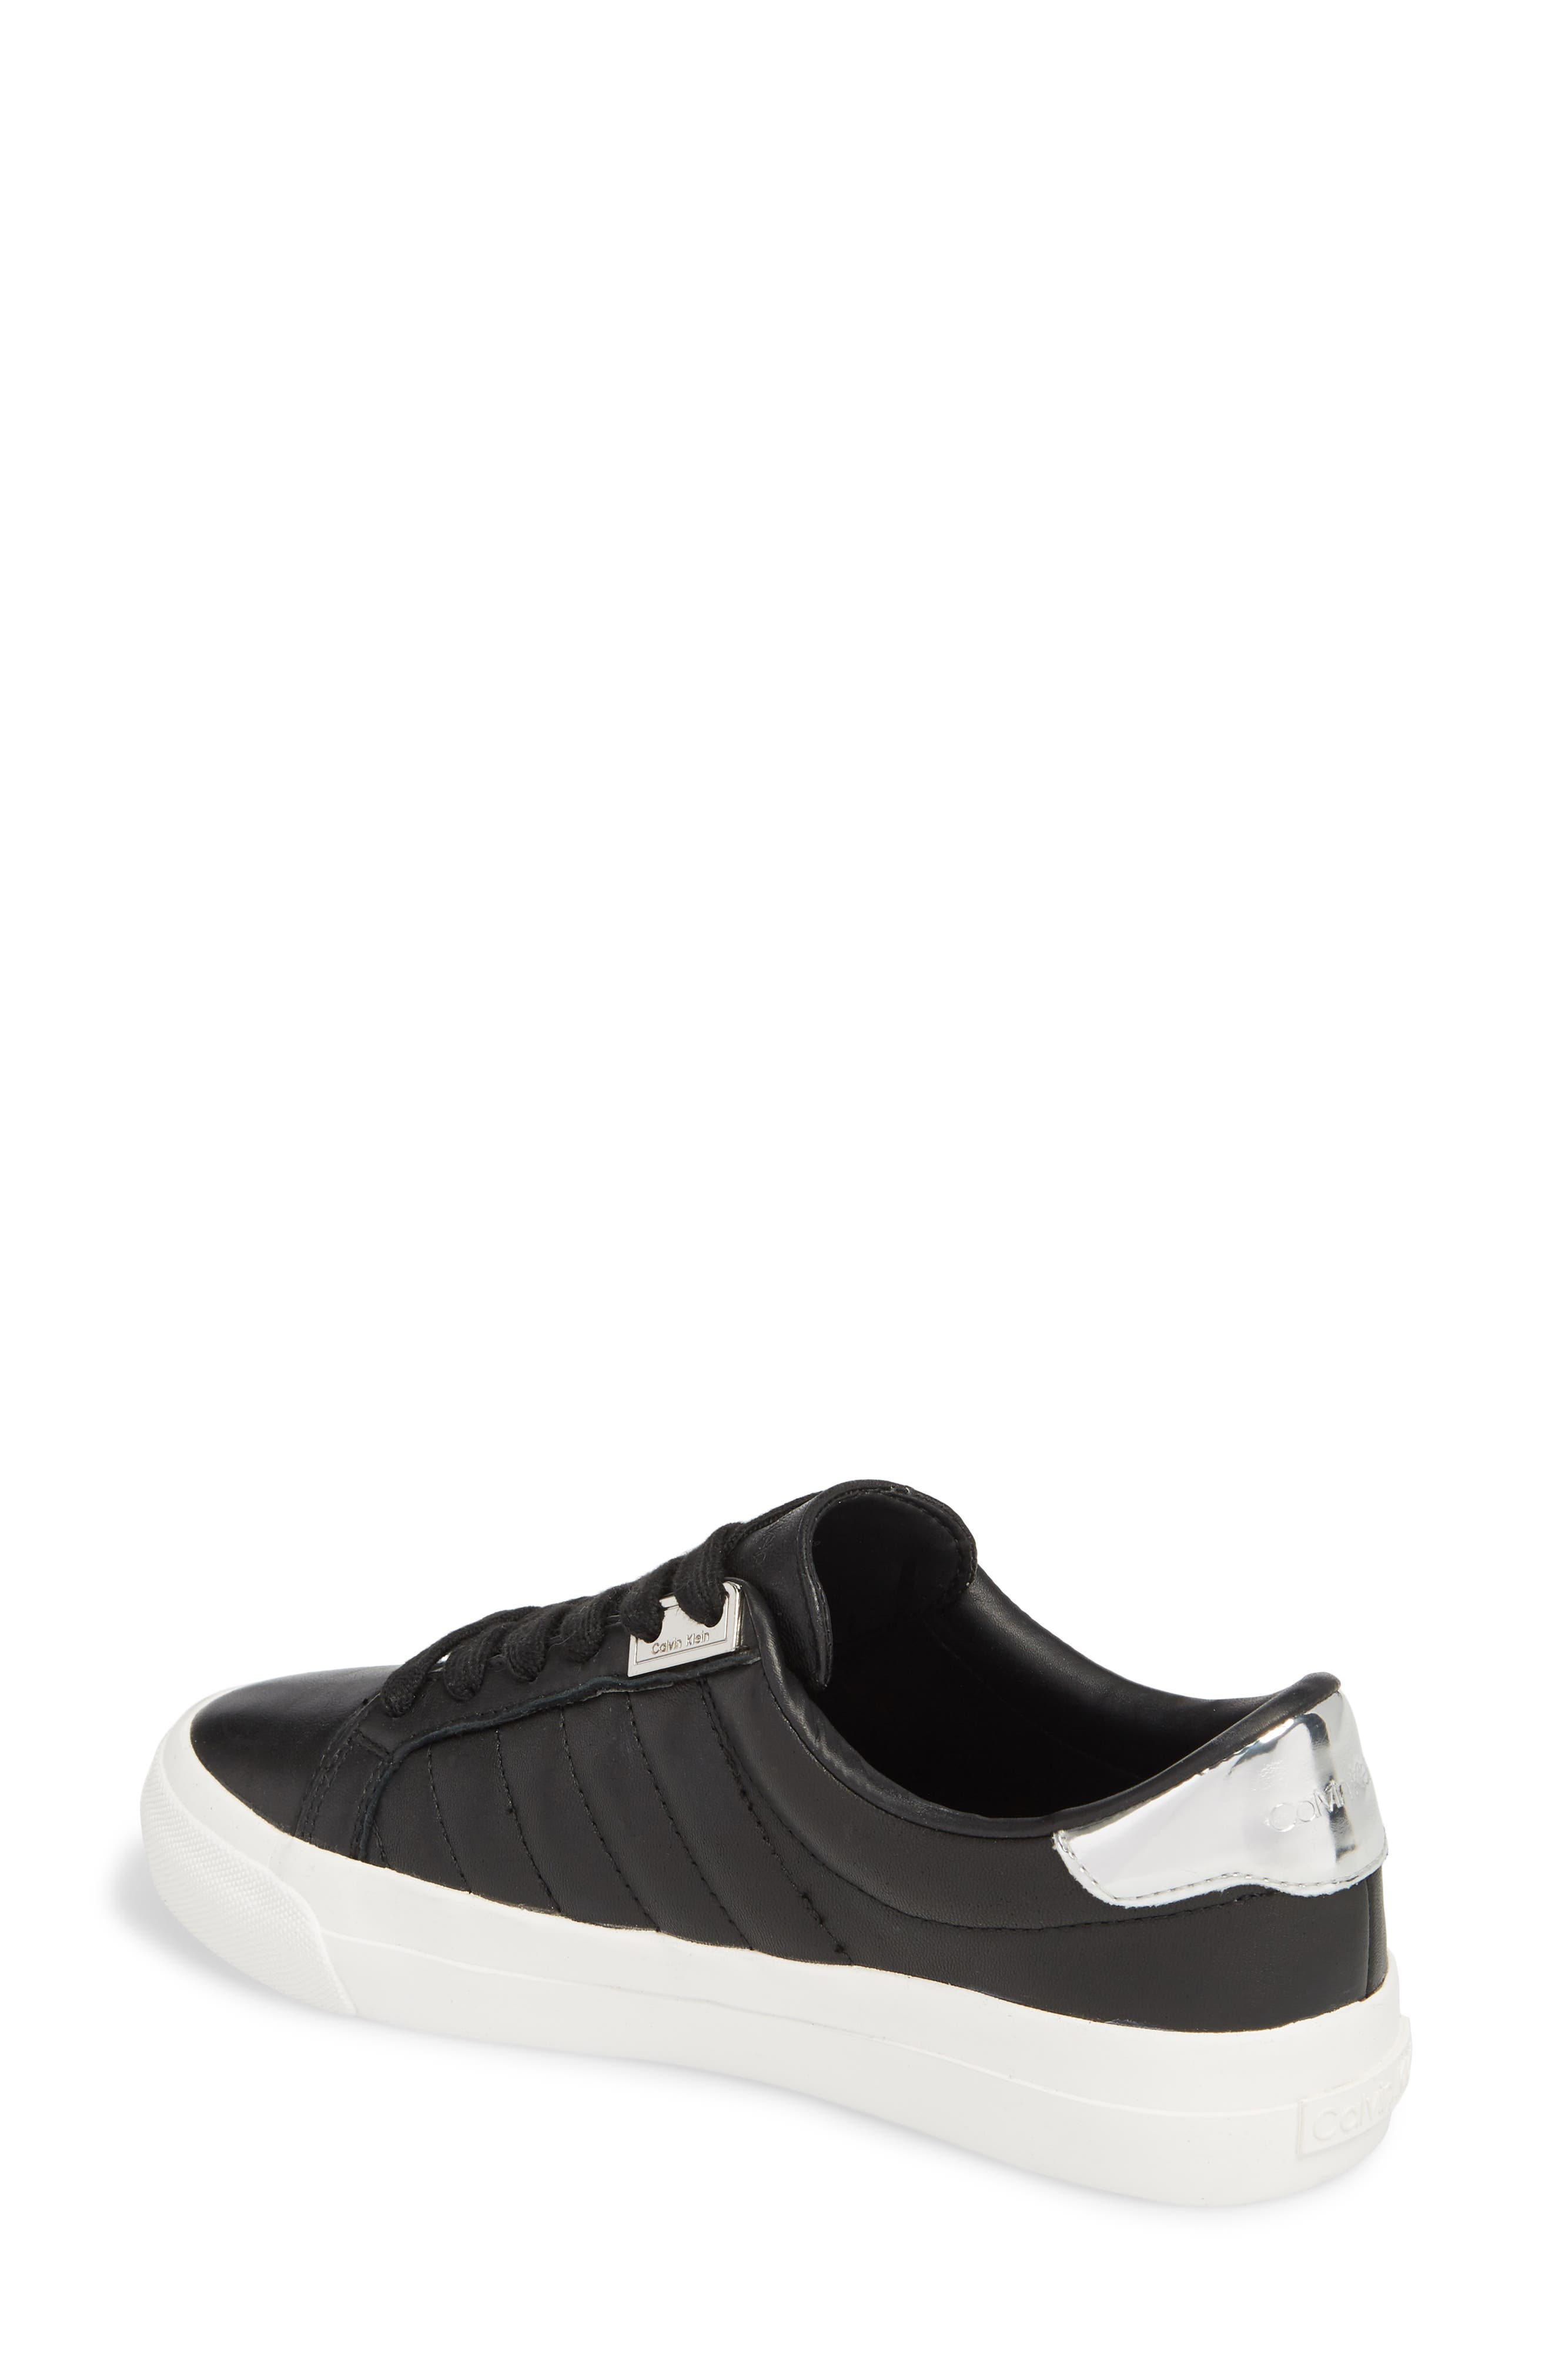 Vance Sneaker,                             Alternate thumbnail 2, color,                             Black Leather